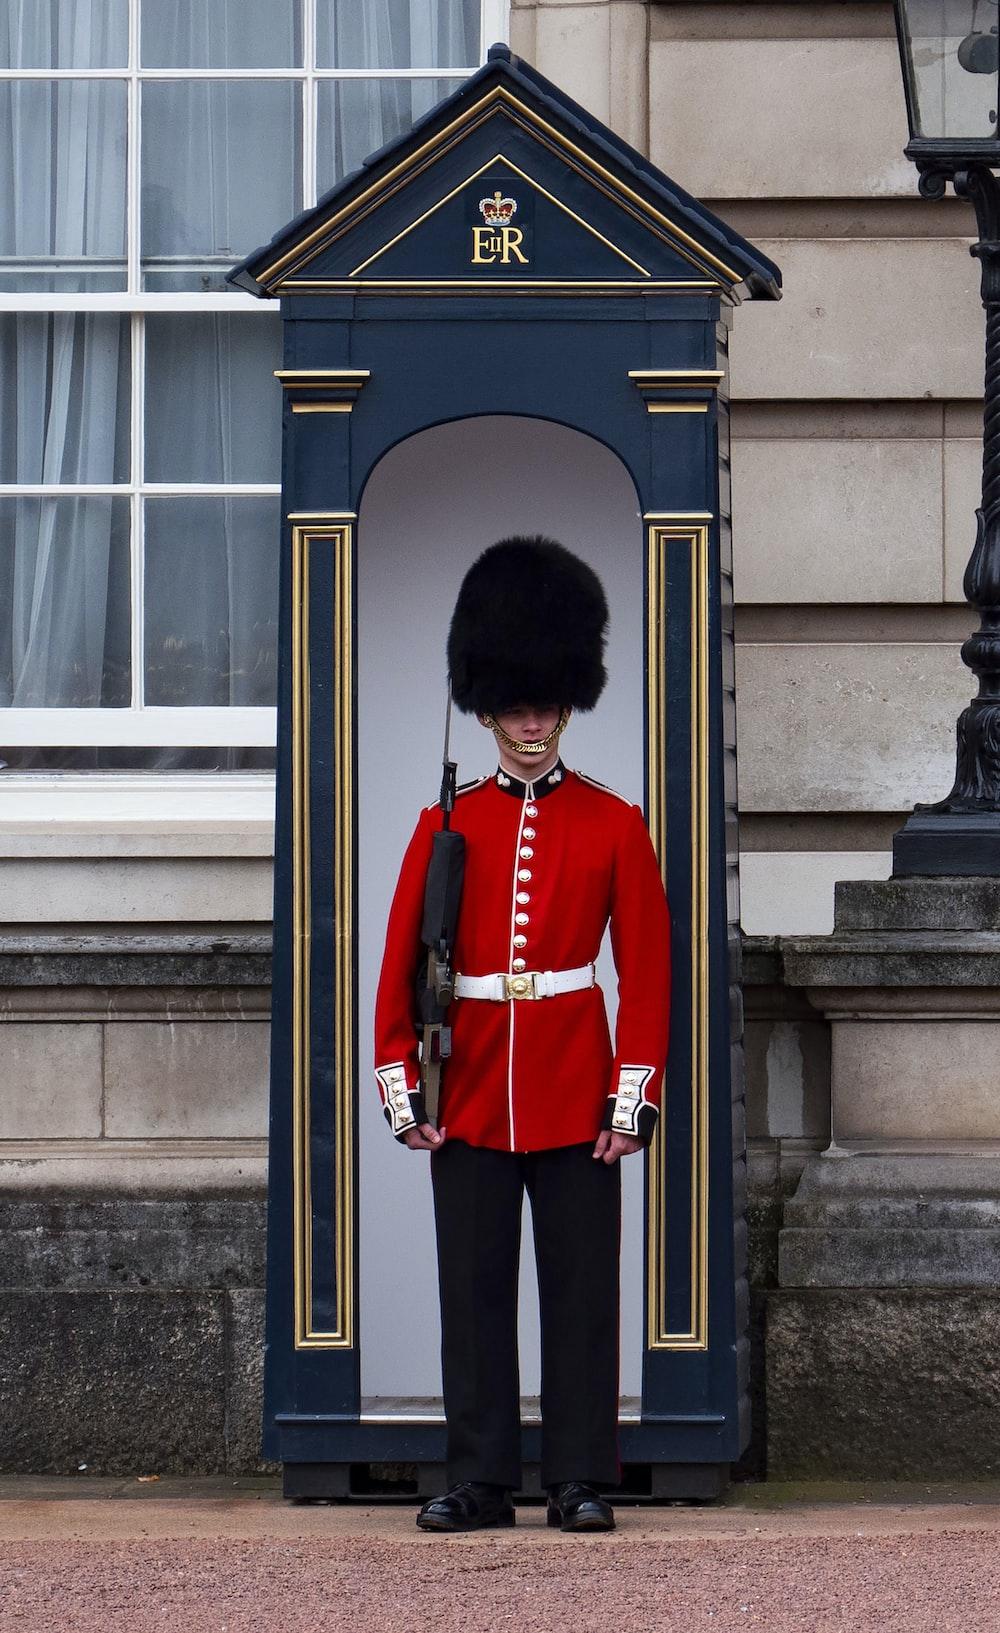 Royal Guard standing near post